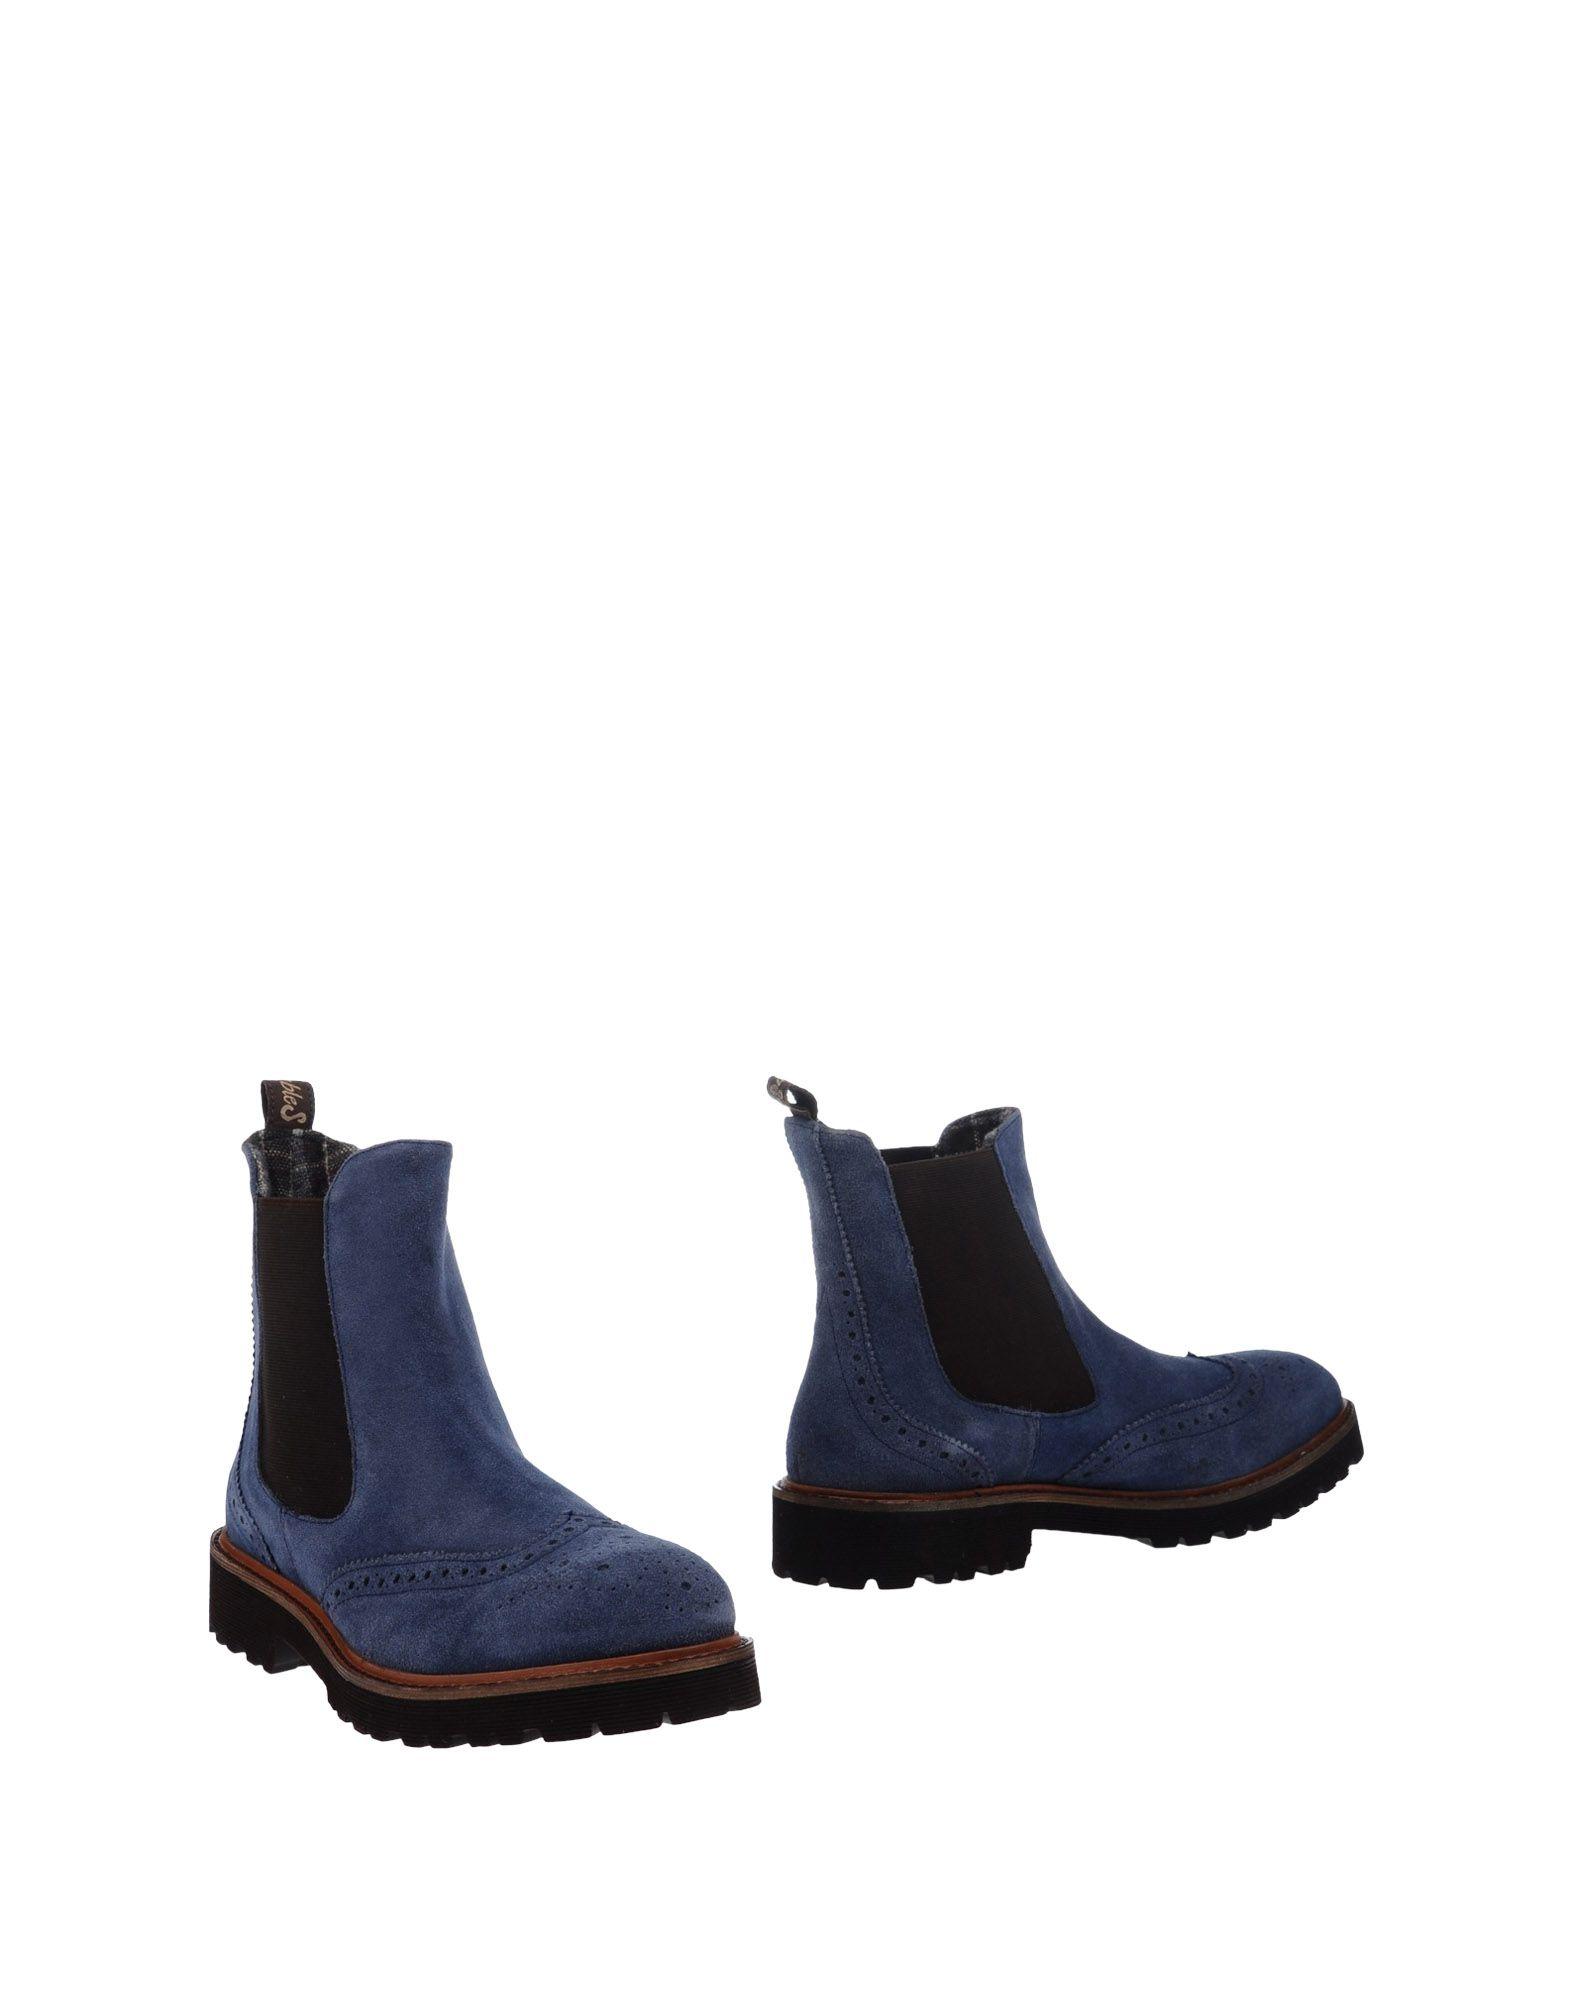 Rabatt echte Schuhe Herren Doubles 4 You® Stiefelette Herren Schuhe  11246411SX 17443c